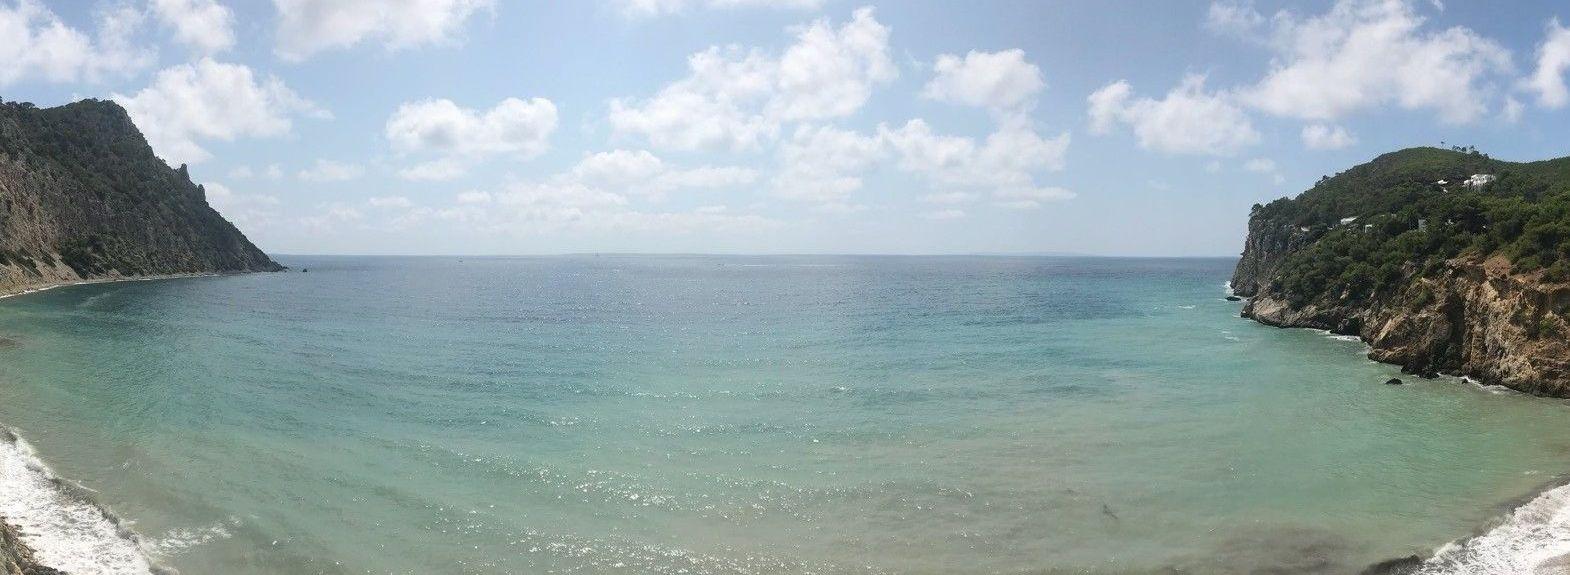 Cala Llonga, Balearic Islands, Spain